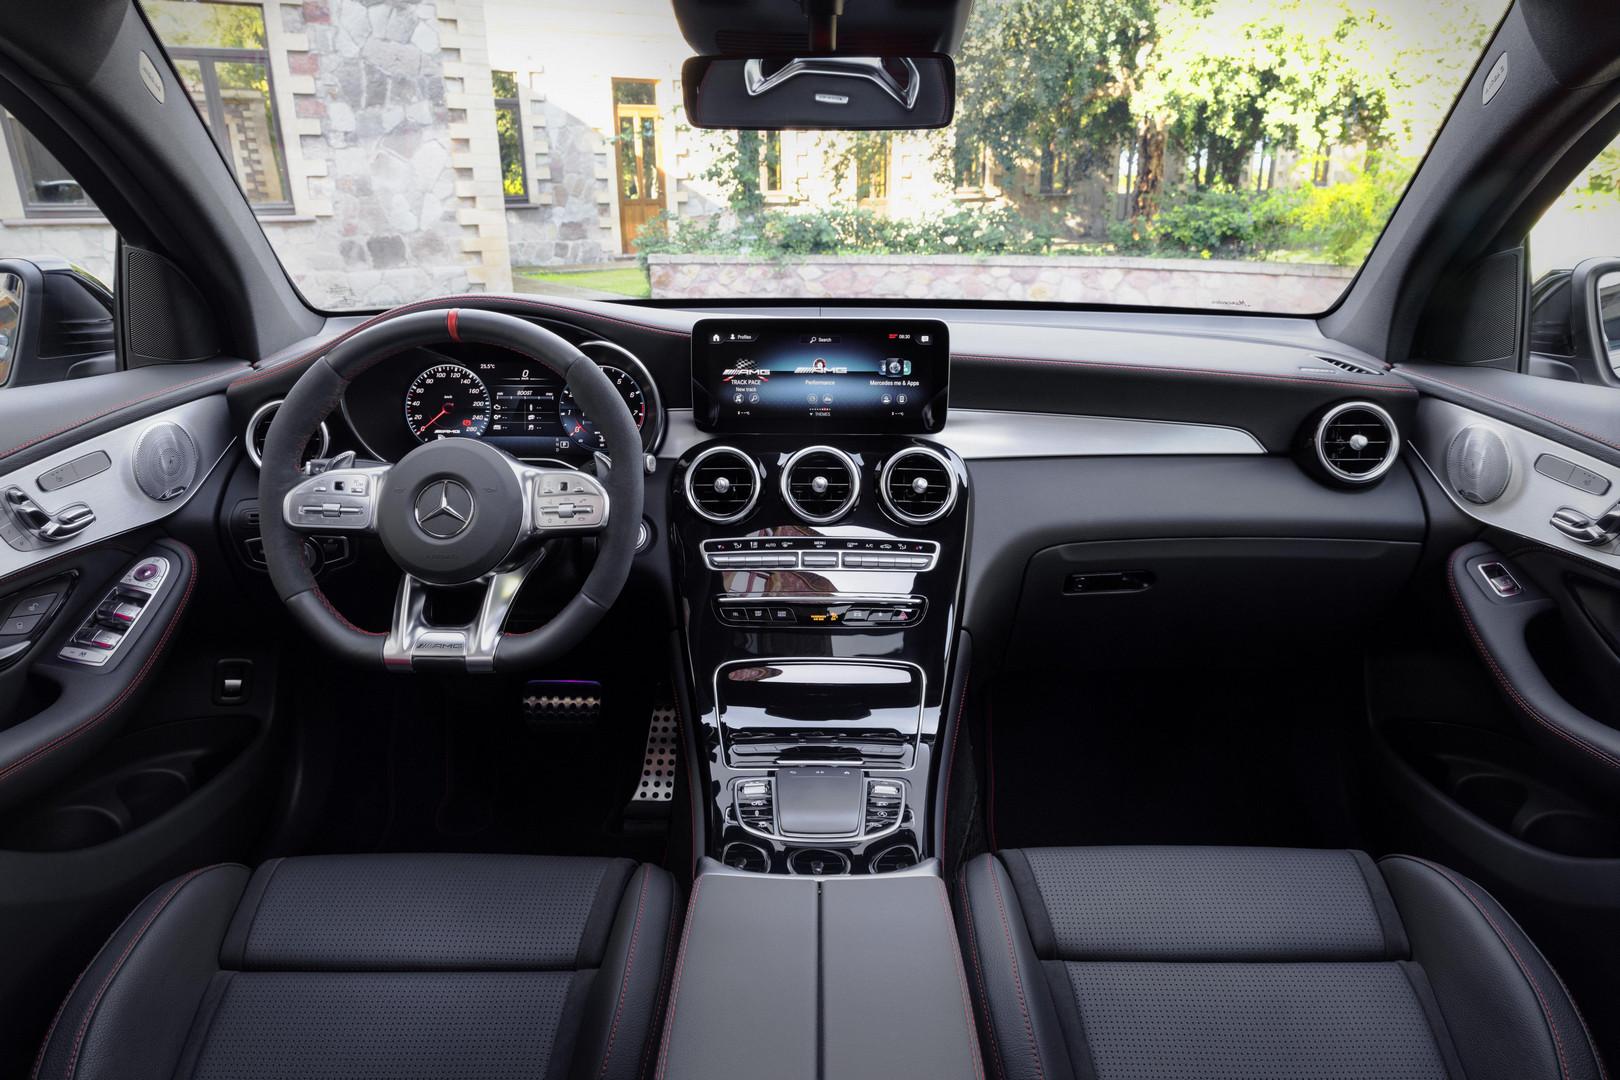 Mercedes-AMG GLC 43 Coupe Steering Wheel